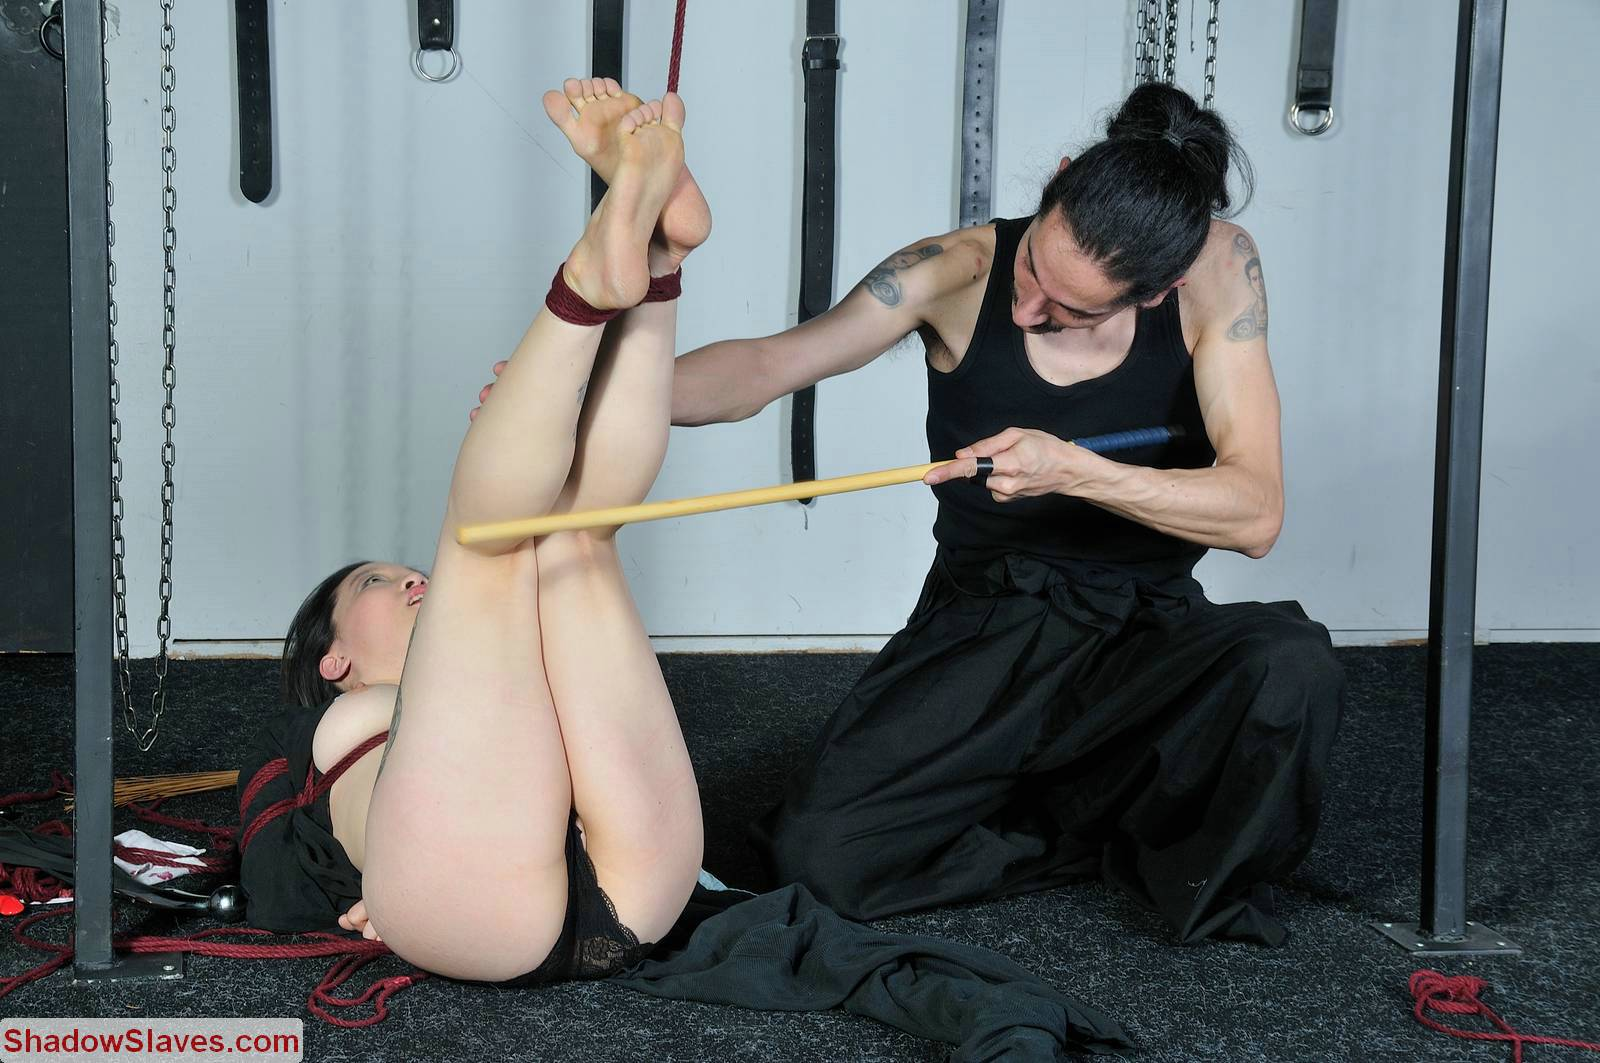 Asian Foot Worship Porn download free asian foot worship asian foot fetish - domme